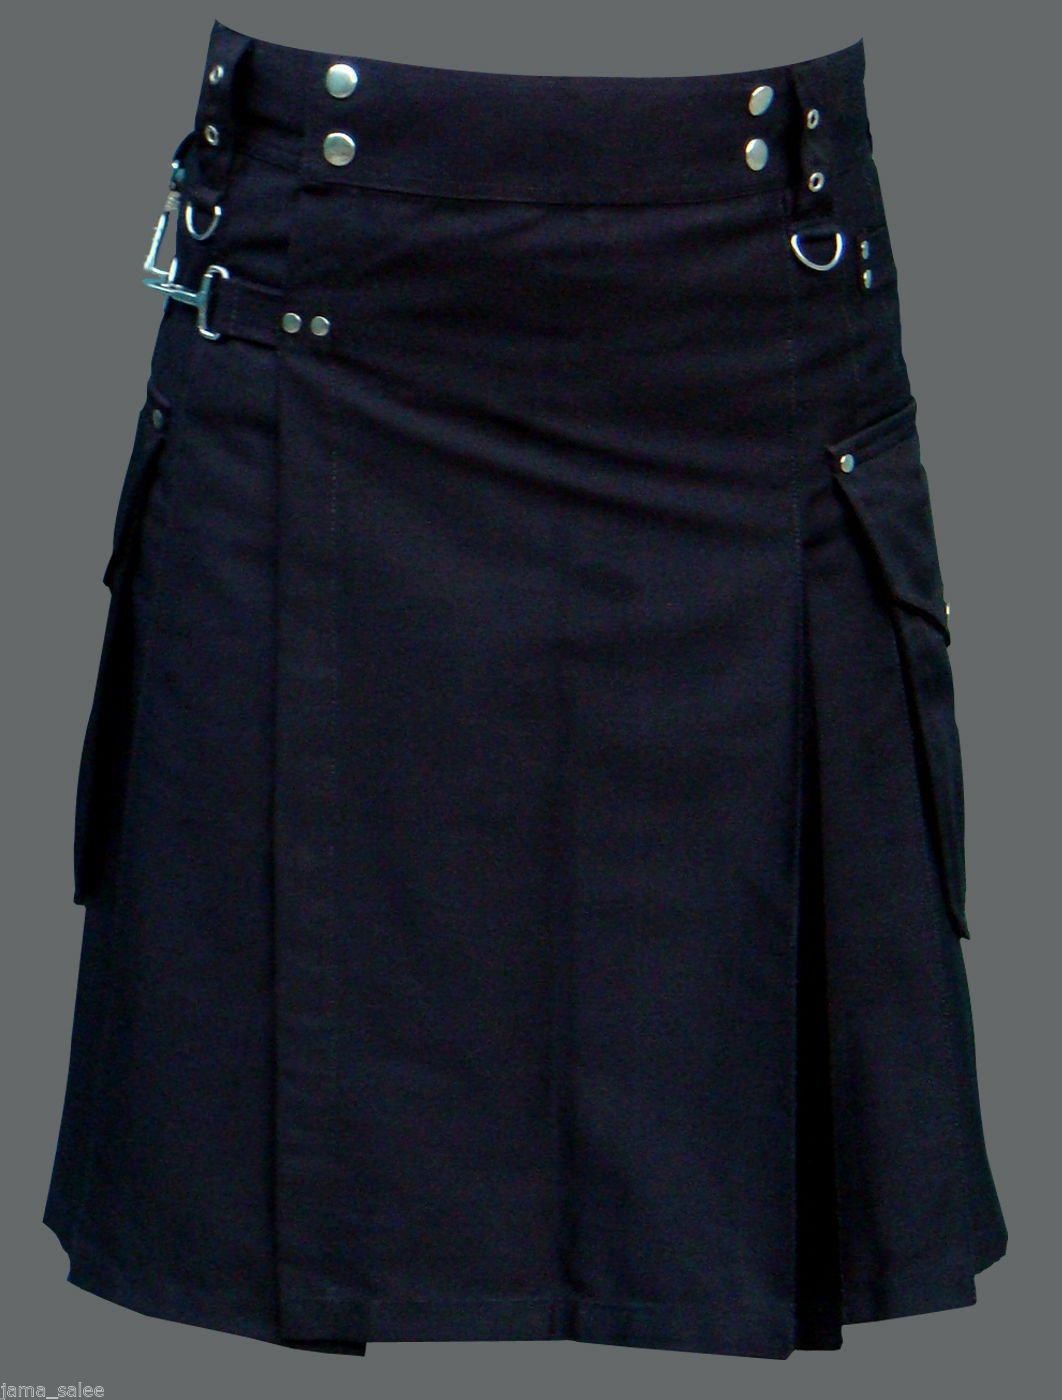 Men 46 Waist Handmade Black Deluxe Utility Kilt 100% Cotton With Cargo Pockets